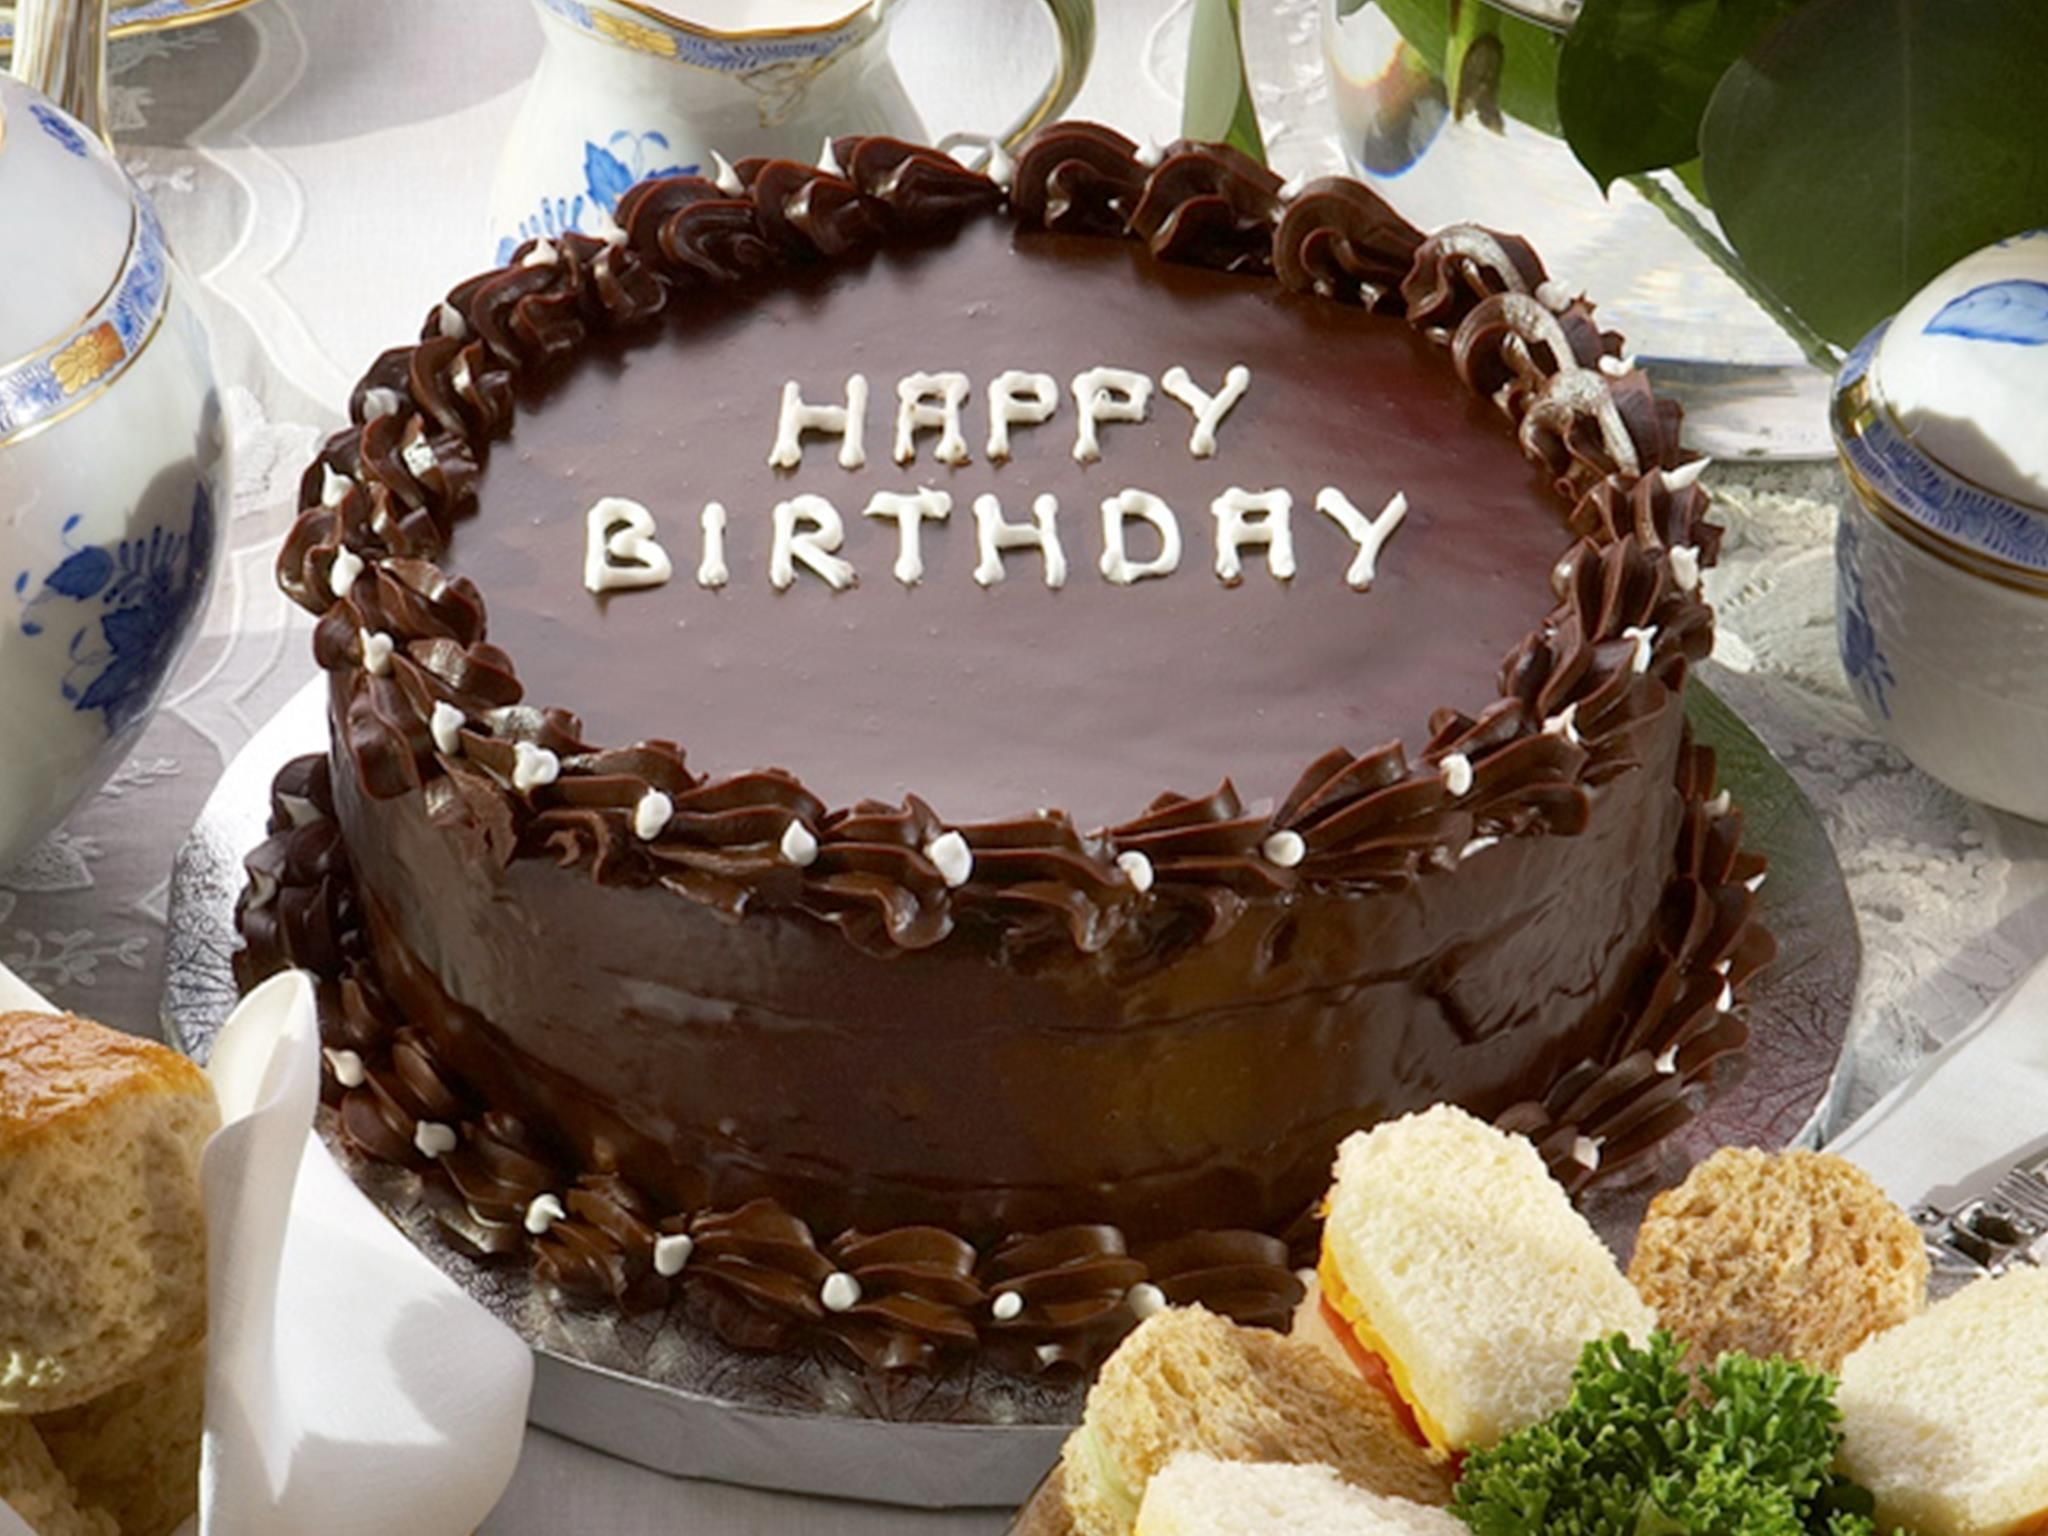 Queen Elizabeth Ii Birthday Chocolate Cake Recipe In 2020